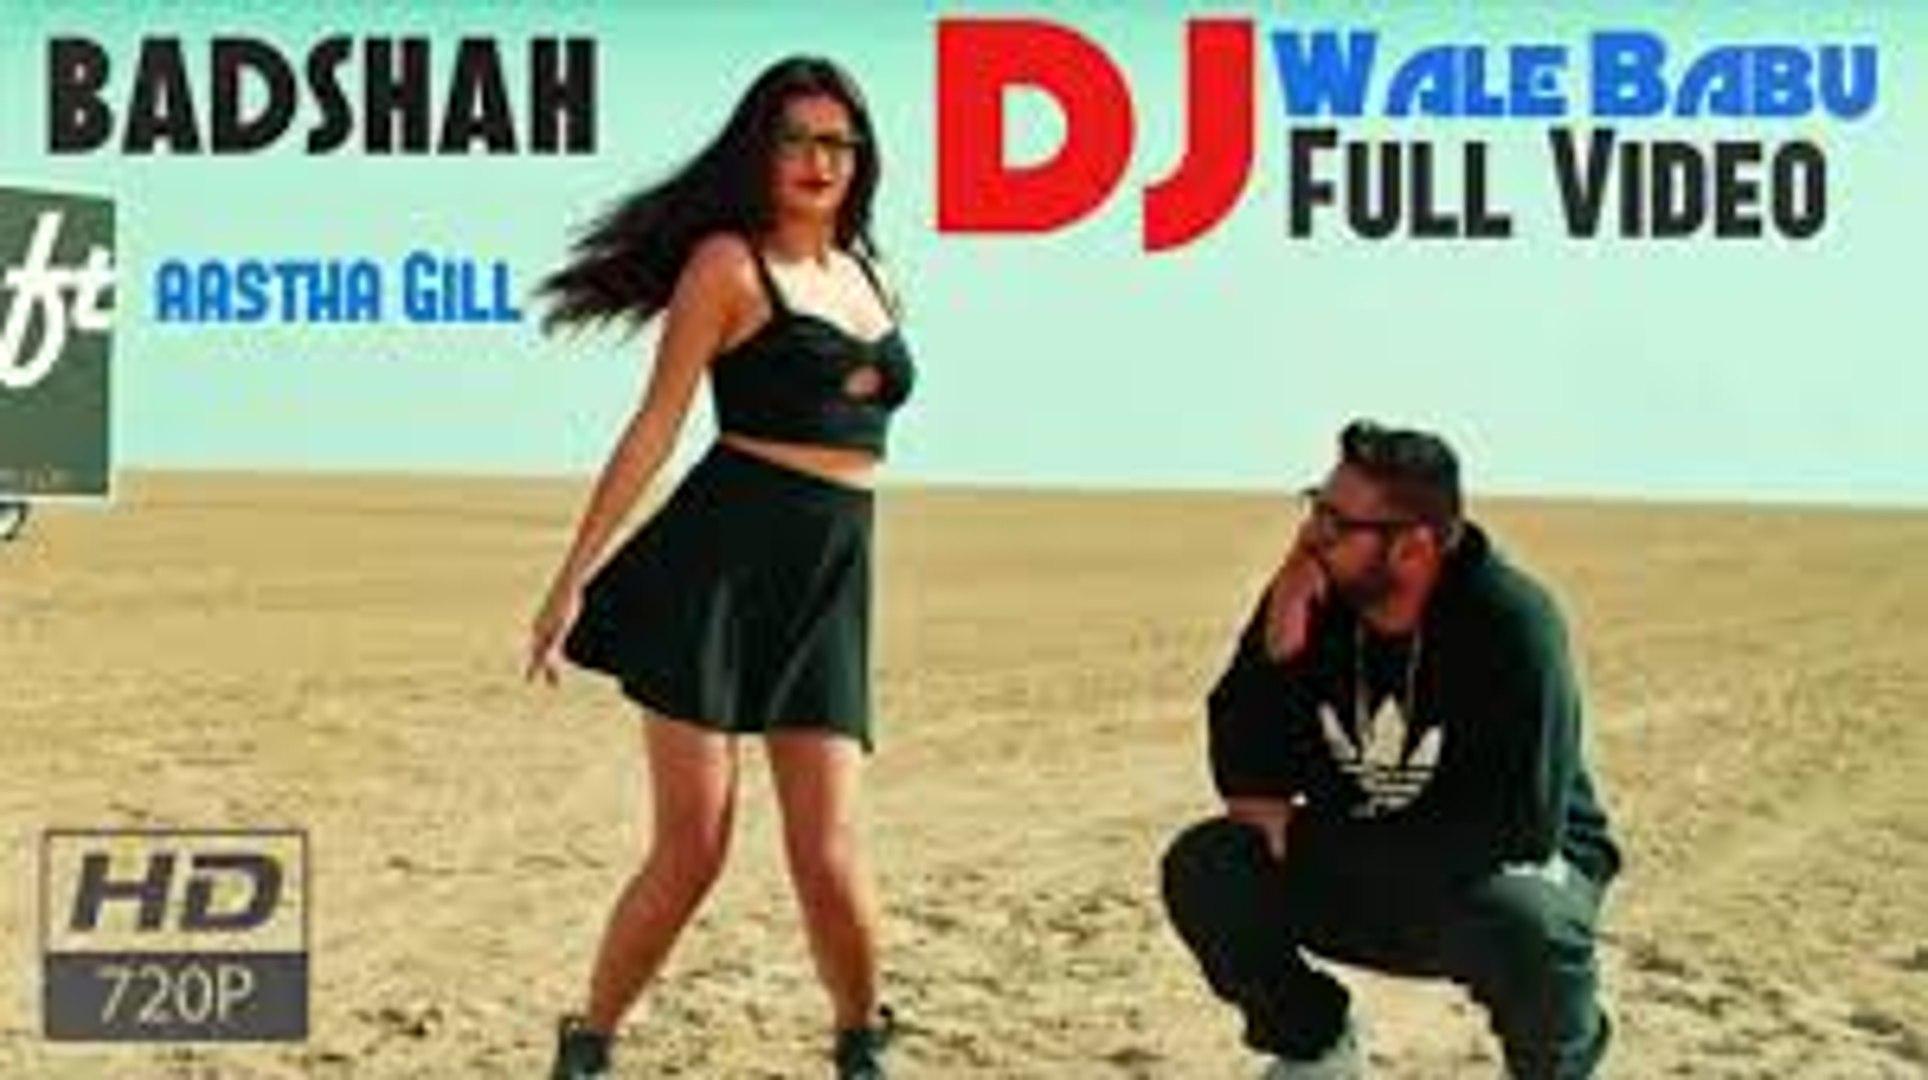 DJ Wale Babu (Full Video) Badshah ft  Aastha Gill - Party Anthem Of 2015 HD